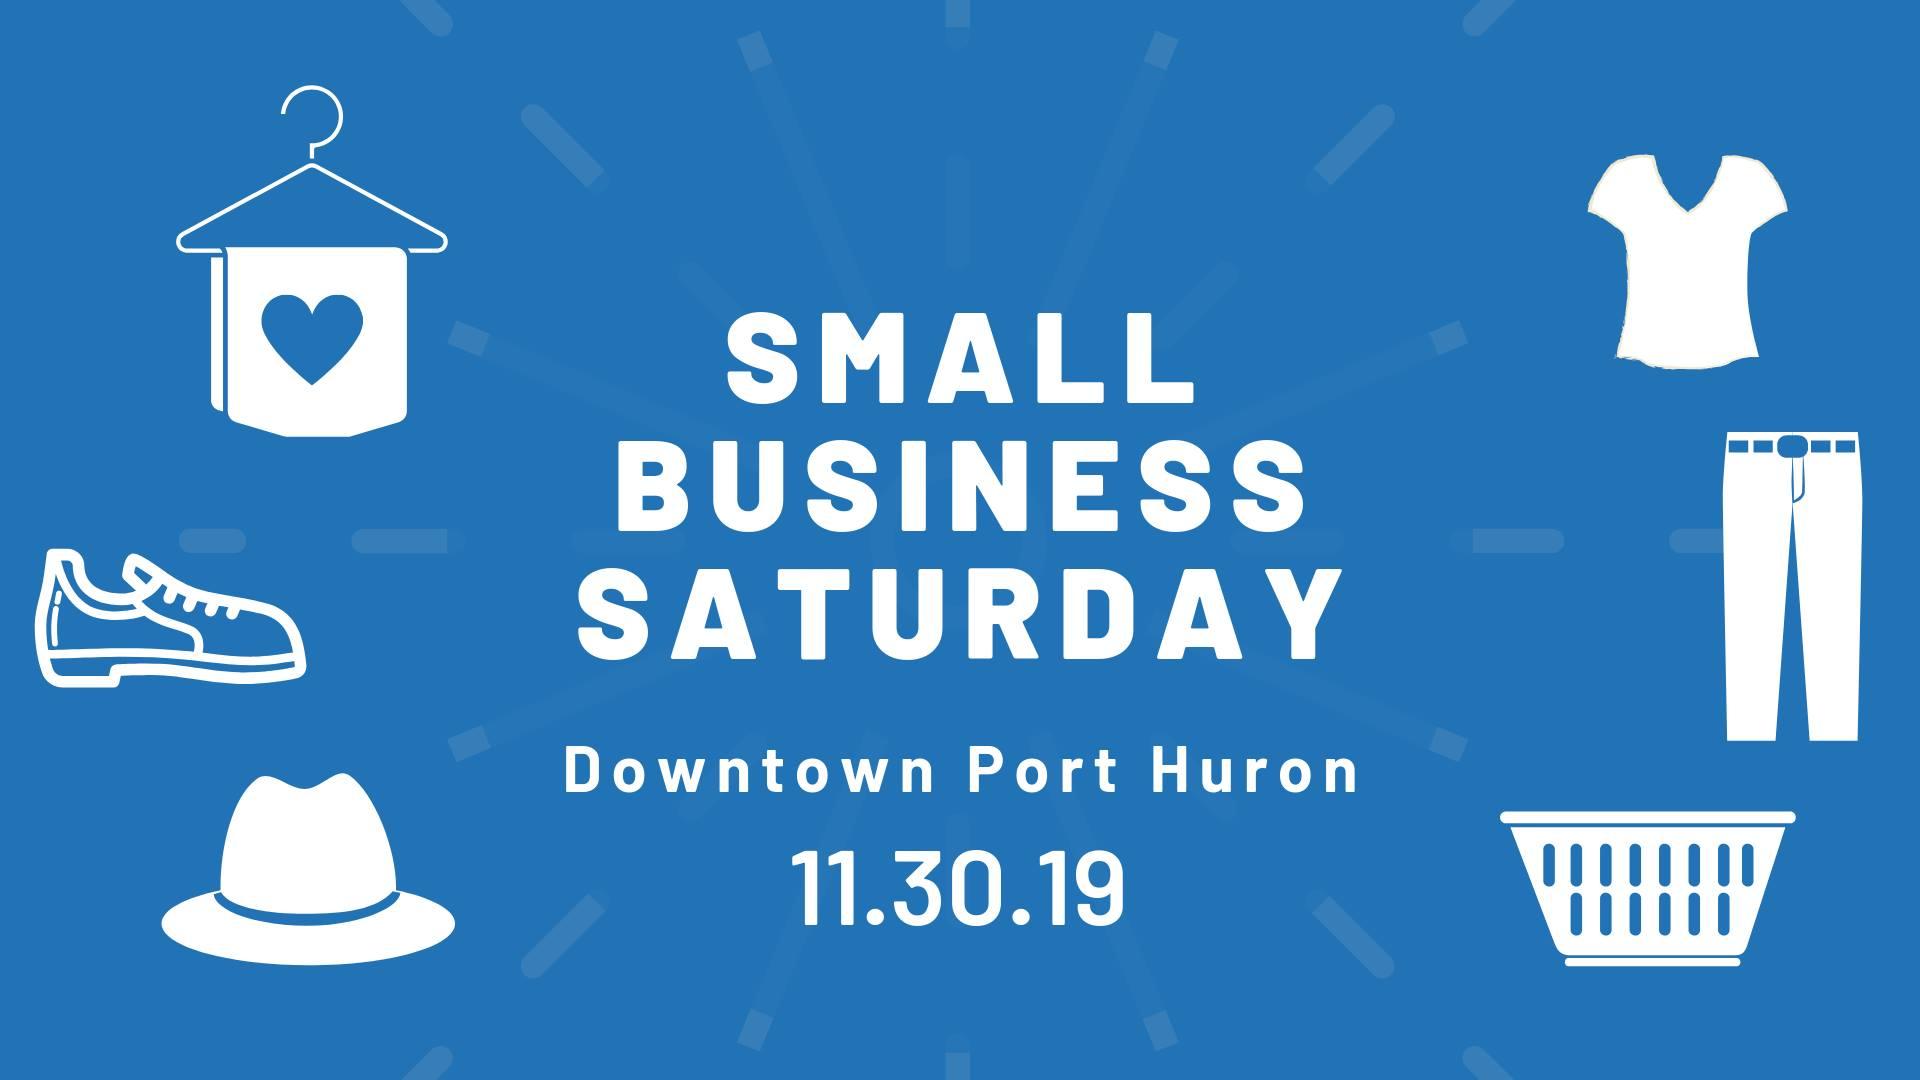 Small Business Saturday in Port Huron Michigan is November 30, 2019